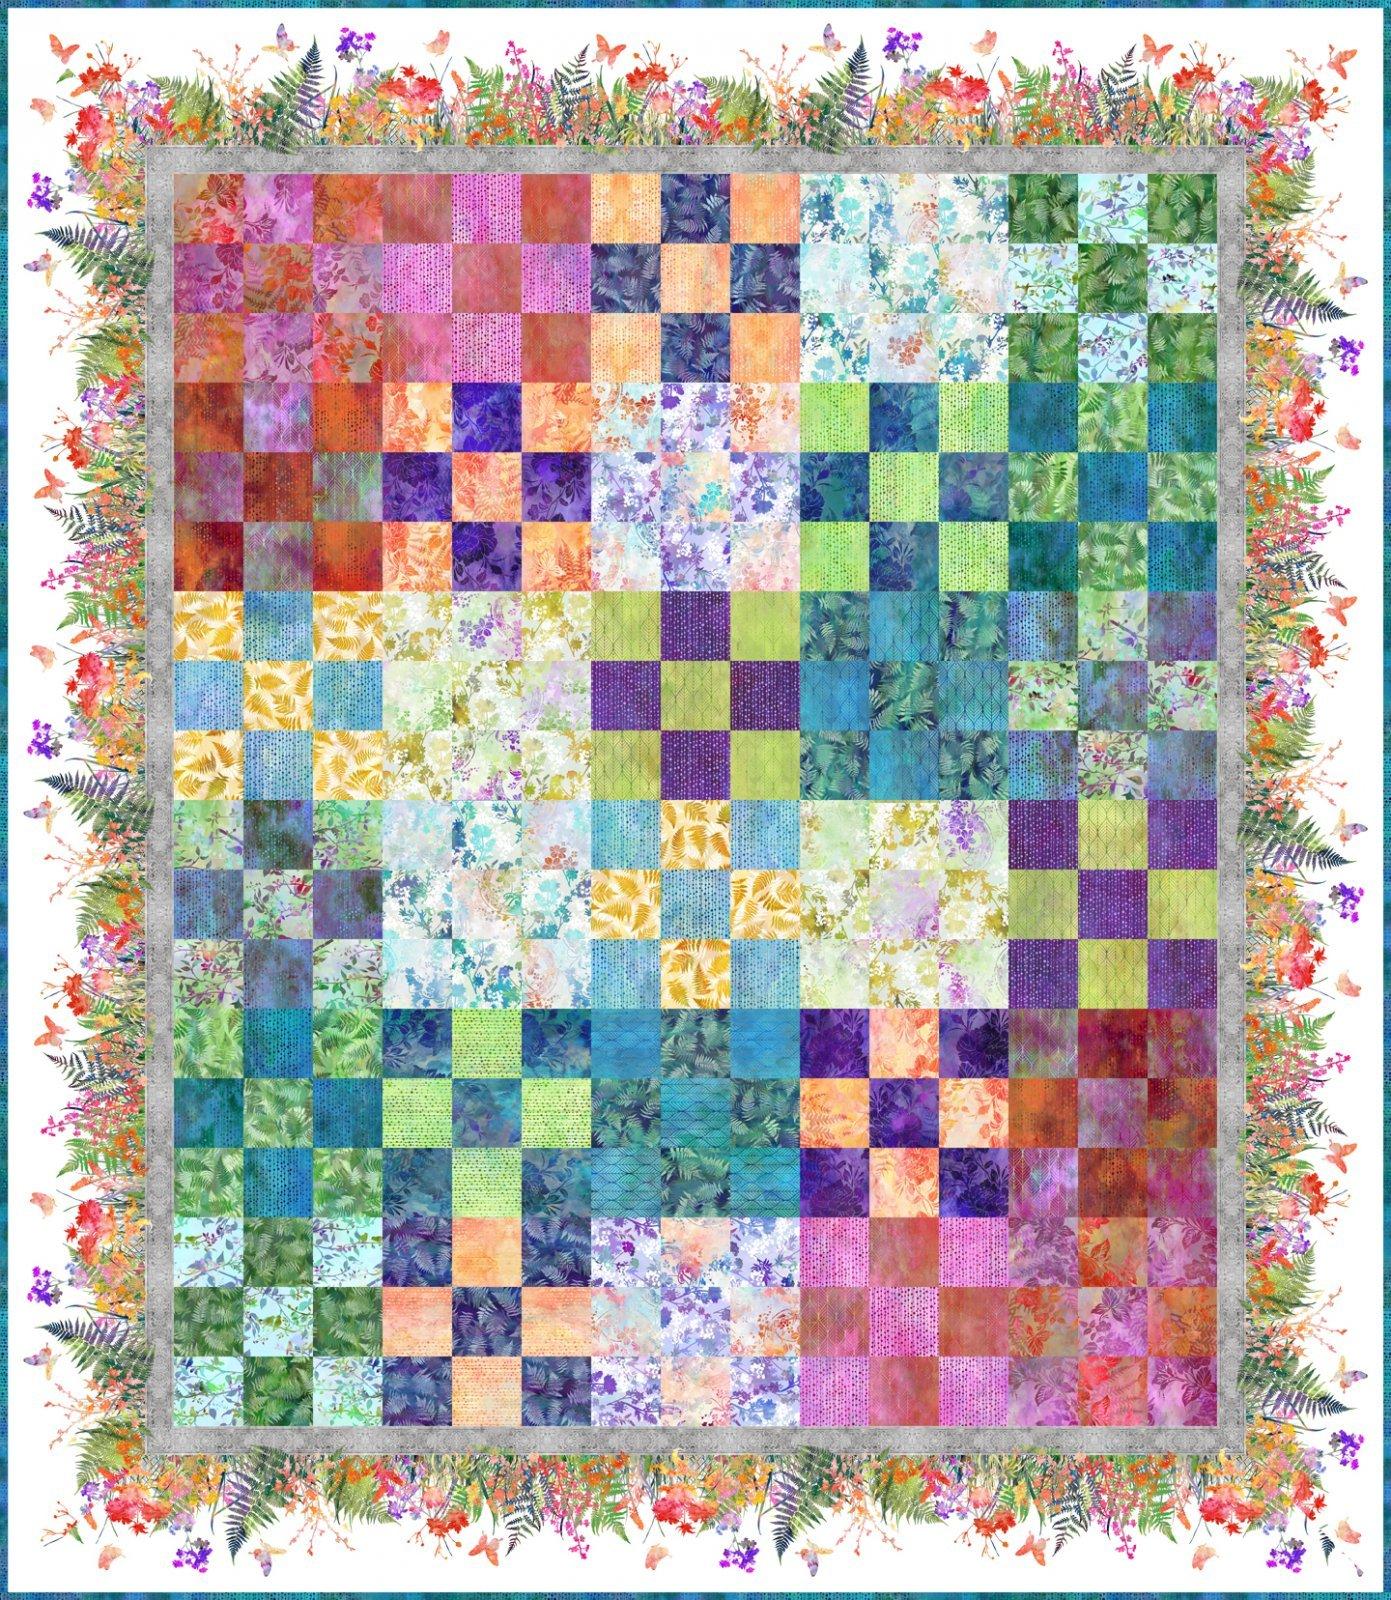 In The Beginning - Garden of Dreams by Jason Yenter - Garden 9-Patch Quilt KIT!